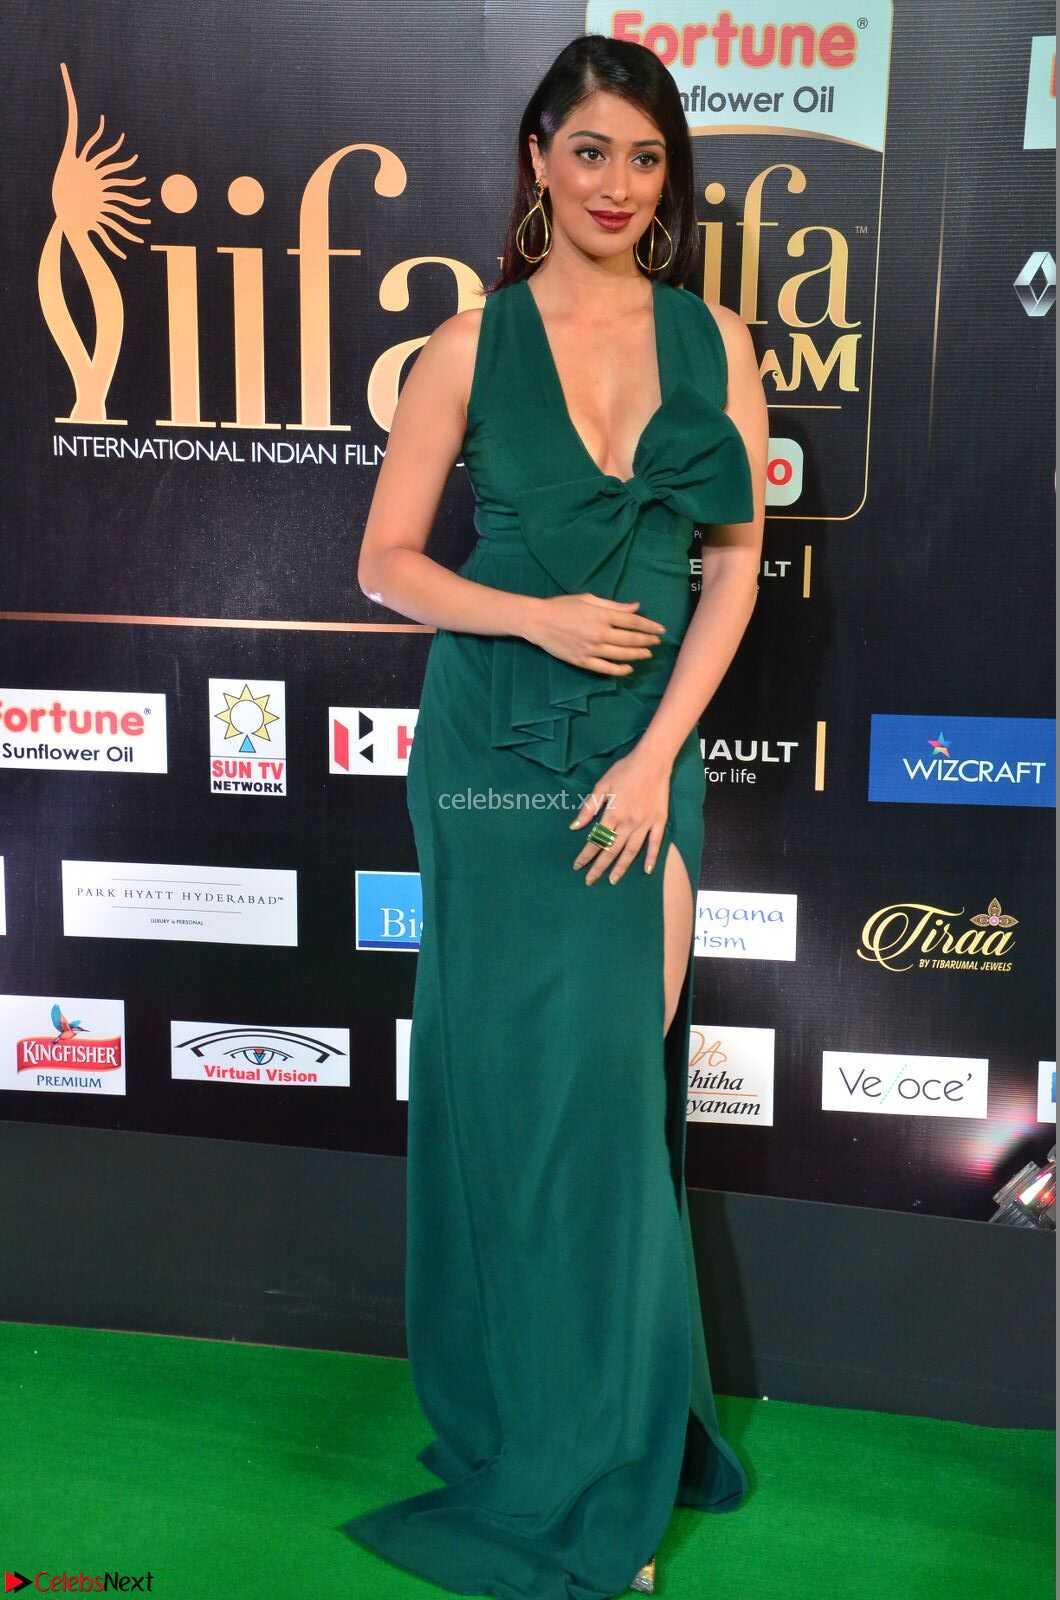 Raai Laxmi in Deep Neck Sleeveless Green Leg Split Gown at IIFA Utsavam Awards 2017  Day 2 - CelebsNext HD Exclusive Pics